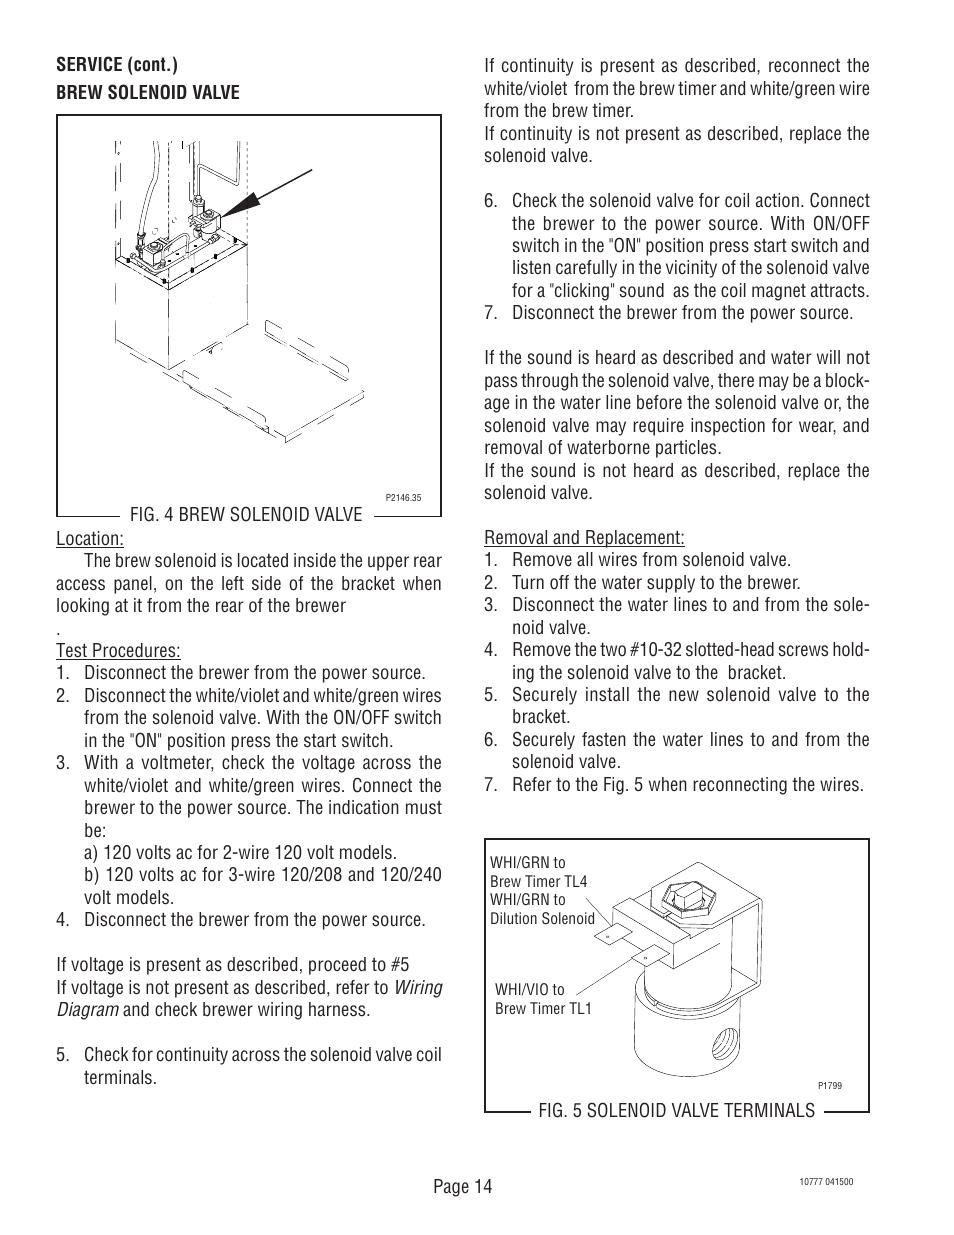 Bunn Switch Wiring Diagram Library Single Tu5q User Manual Page 14 23